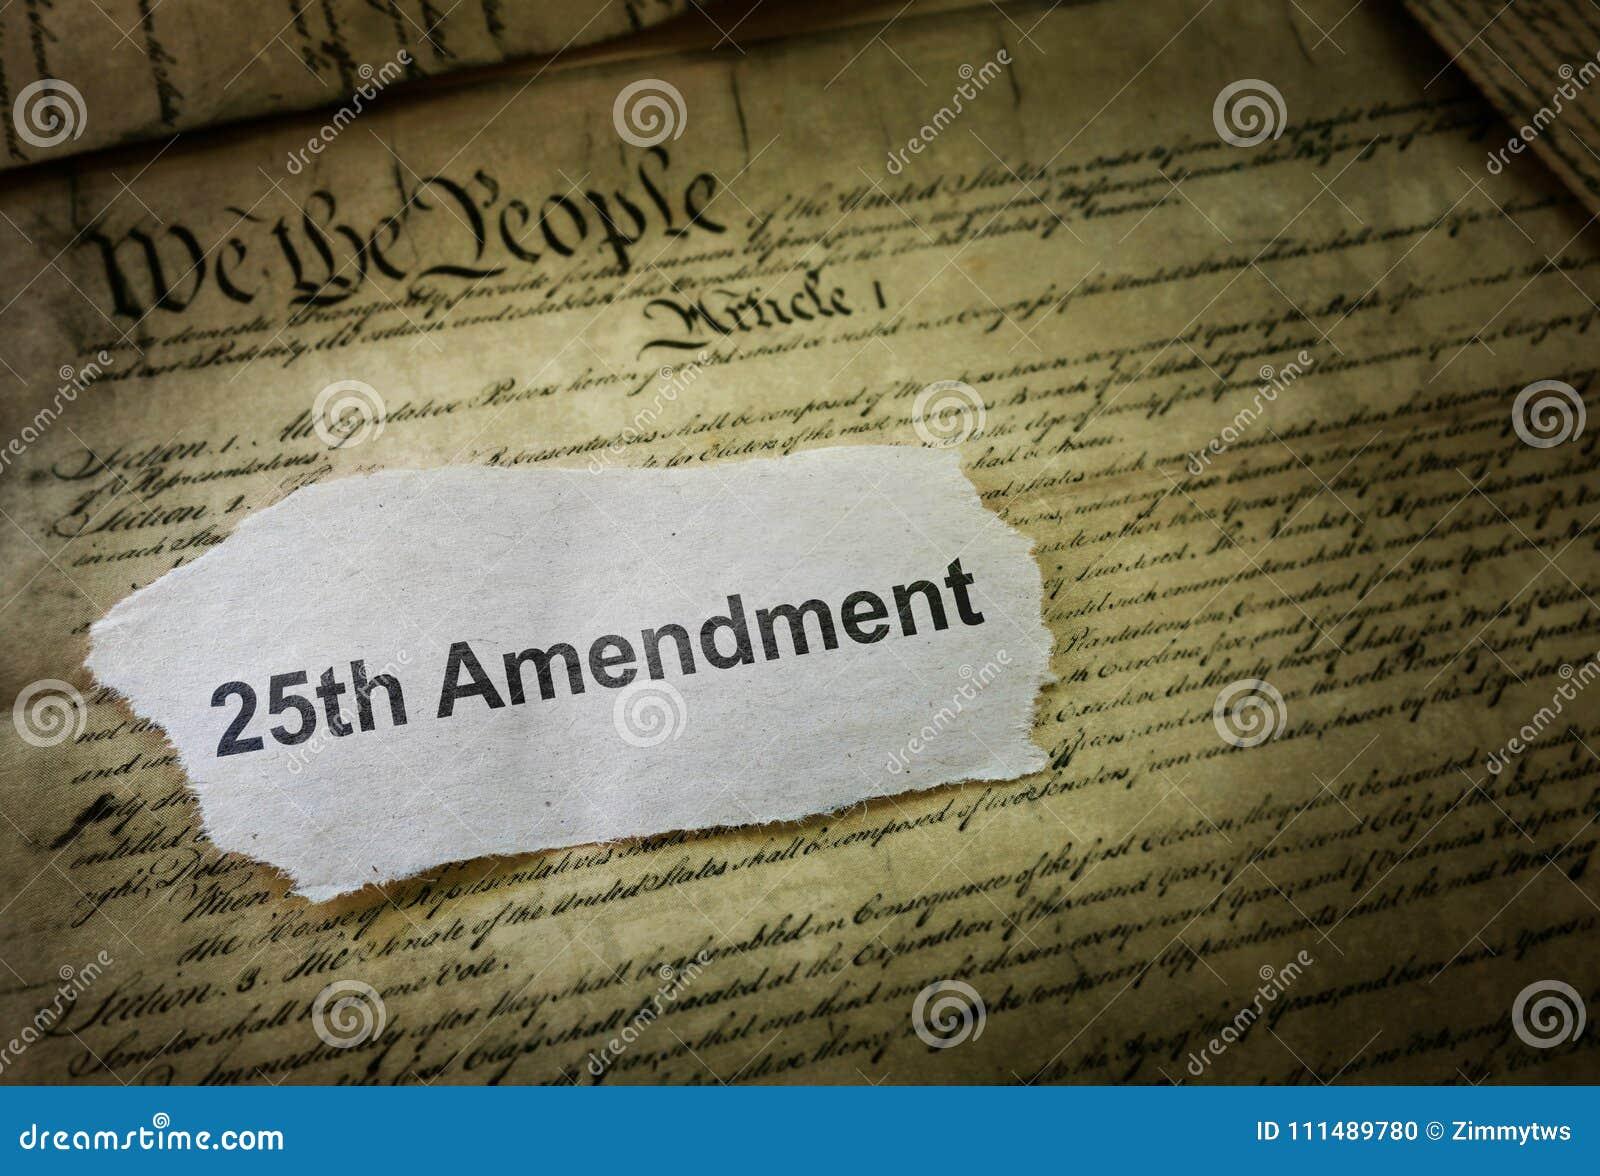 25th Amendment News Headline